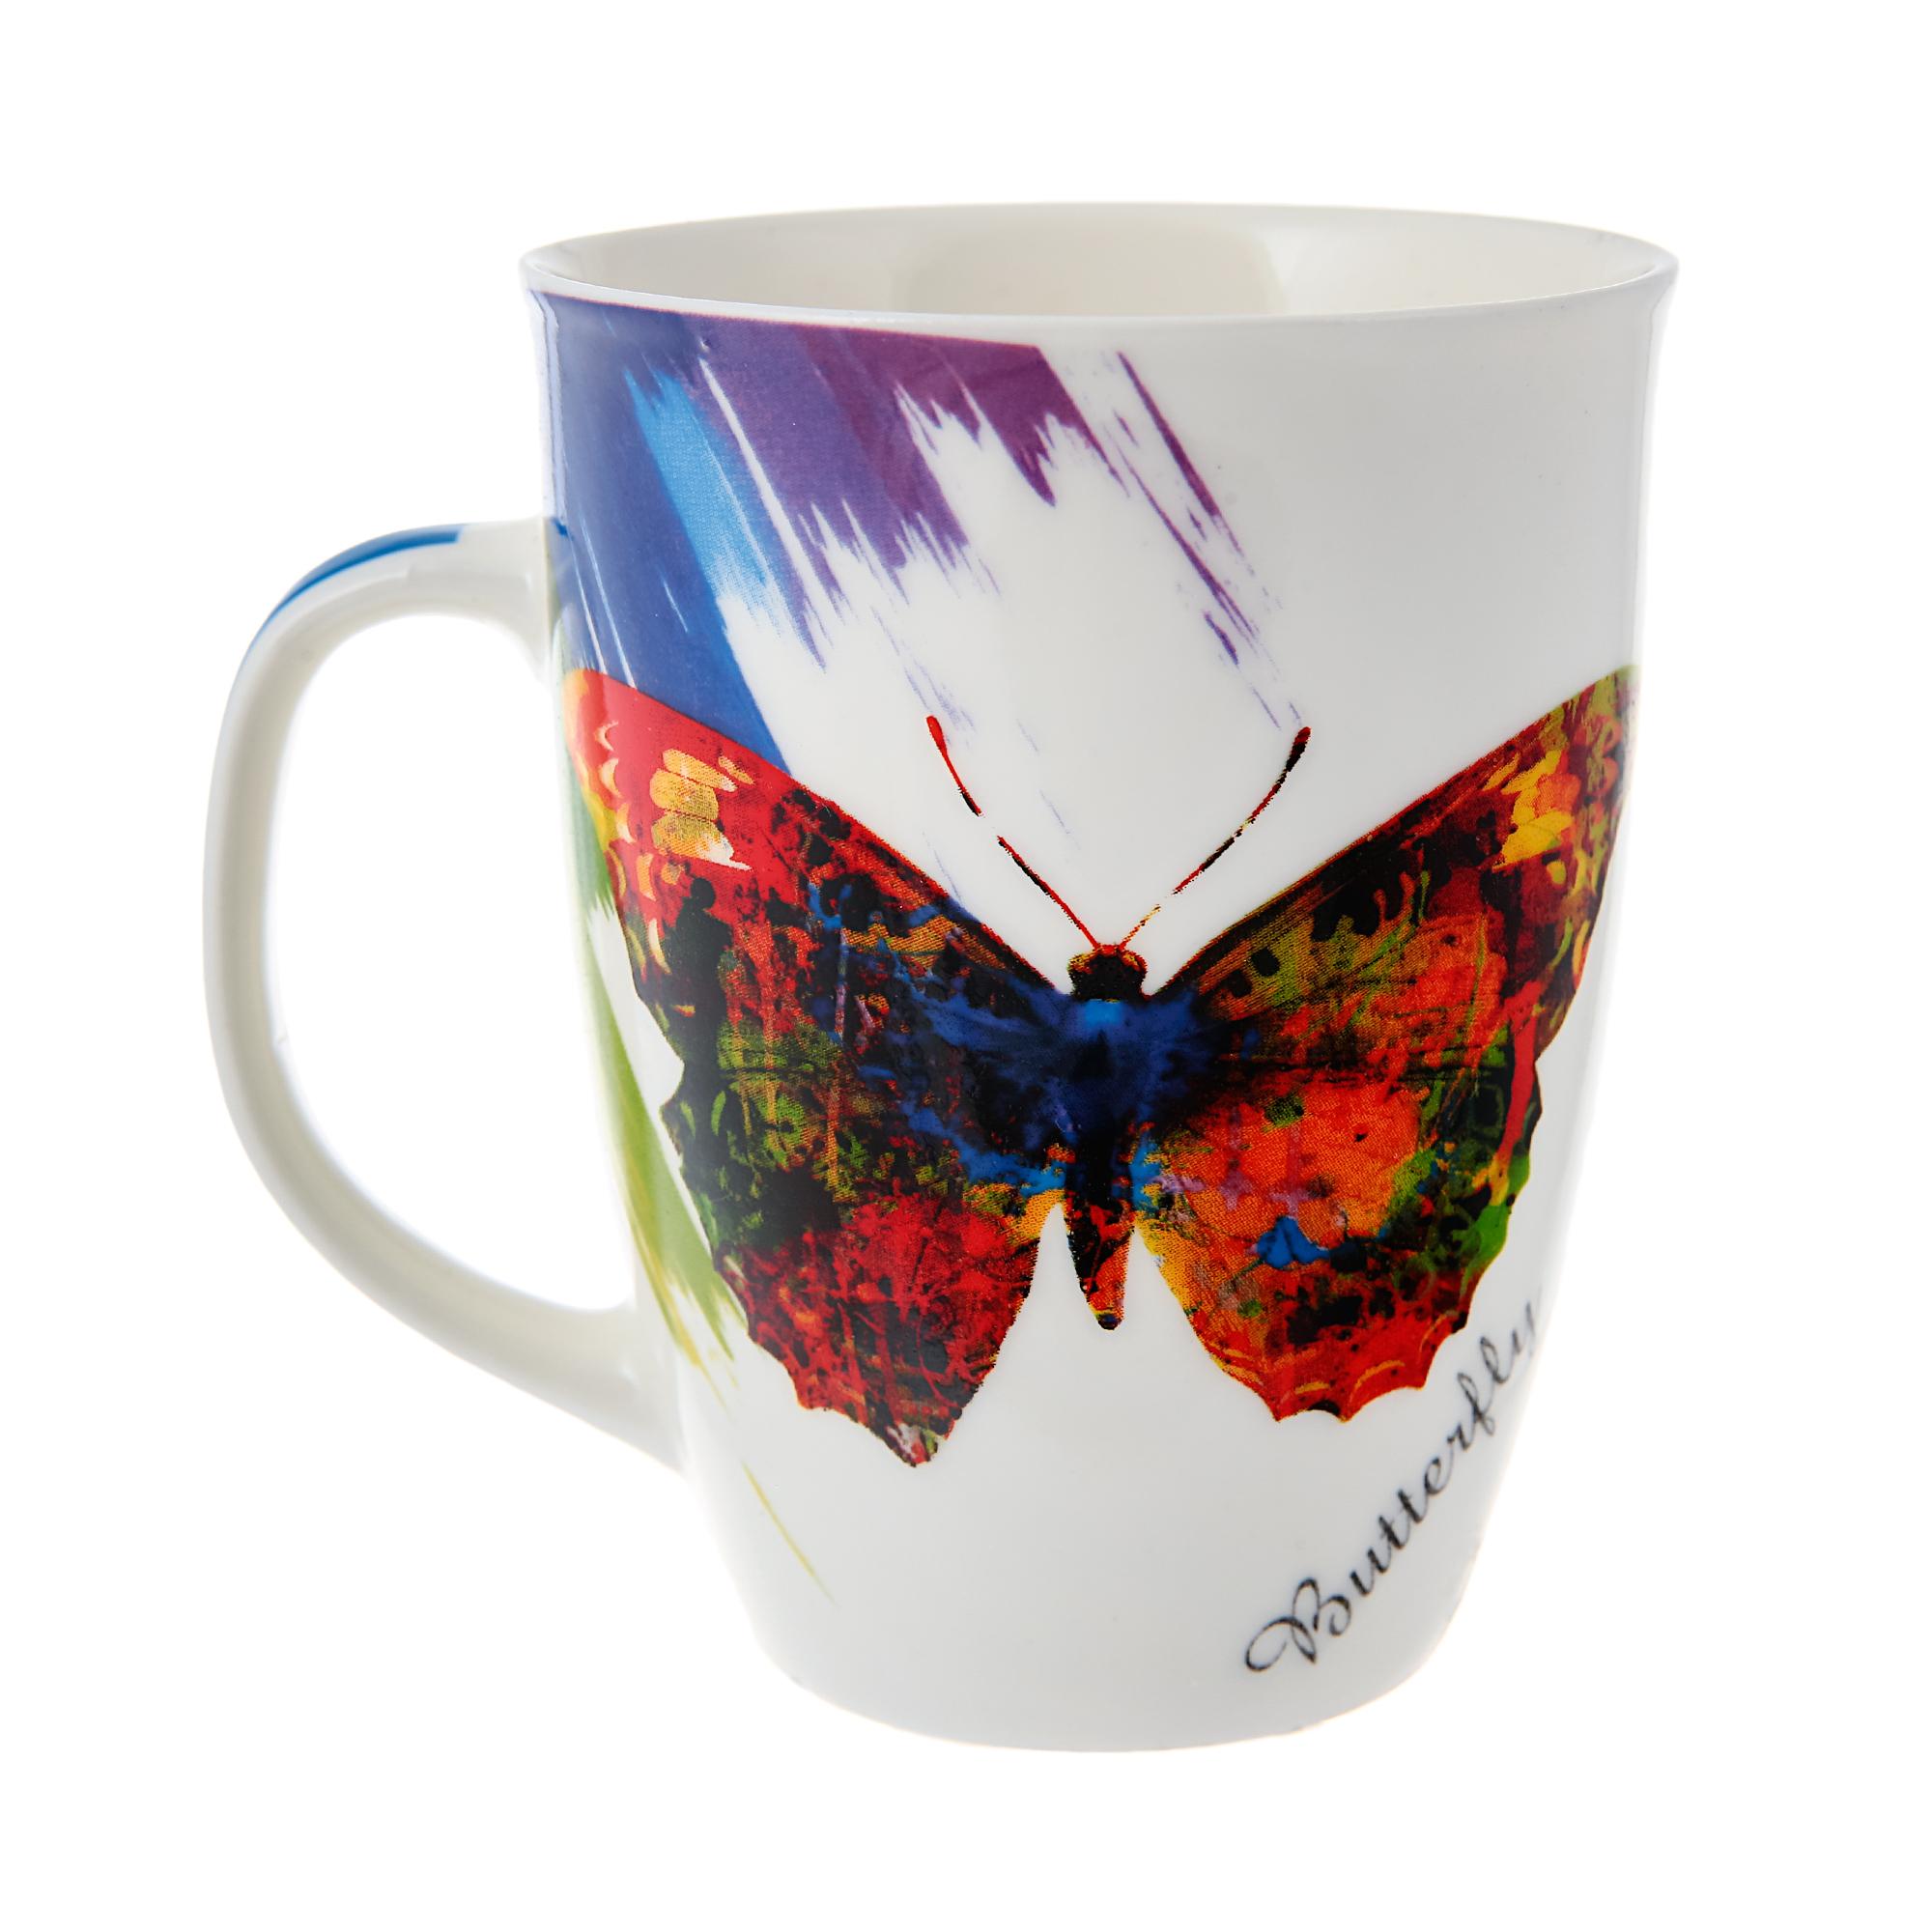 Купить Кружка Loraine бабочка 340 мл, Китай, фарфор